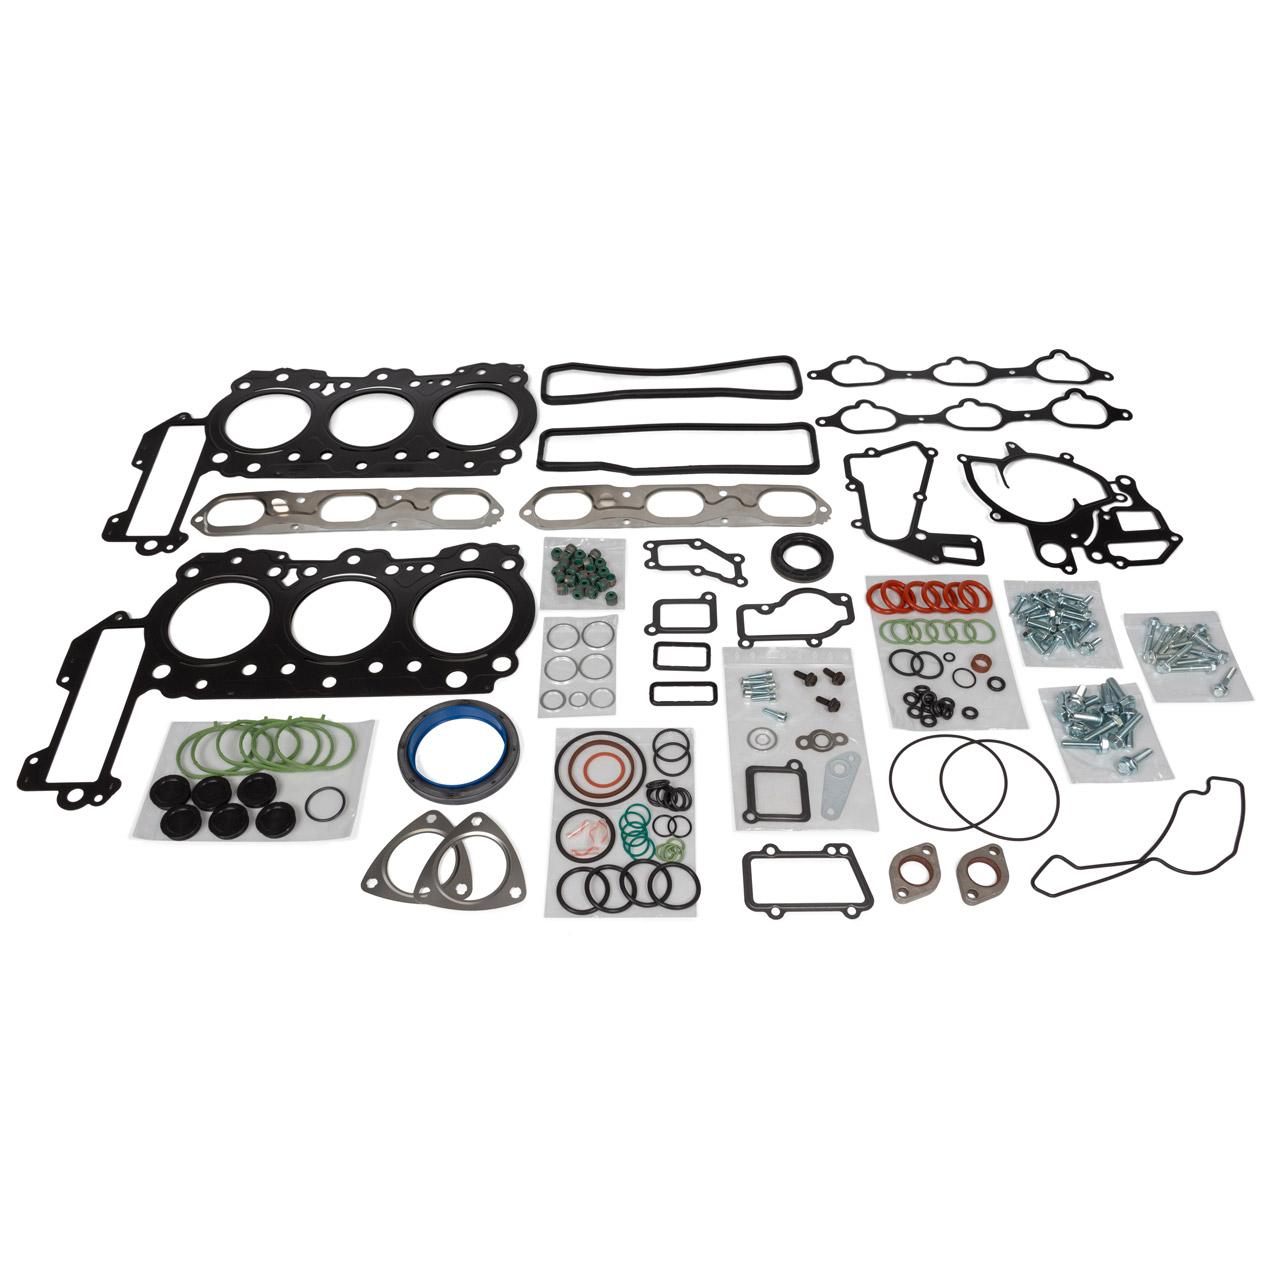 Motordichtungssatz PORSCHE 996 3.4 Carrera / 4 301/320 PS M96.01/02/04